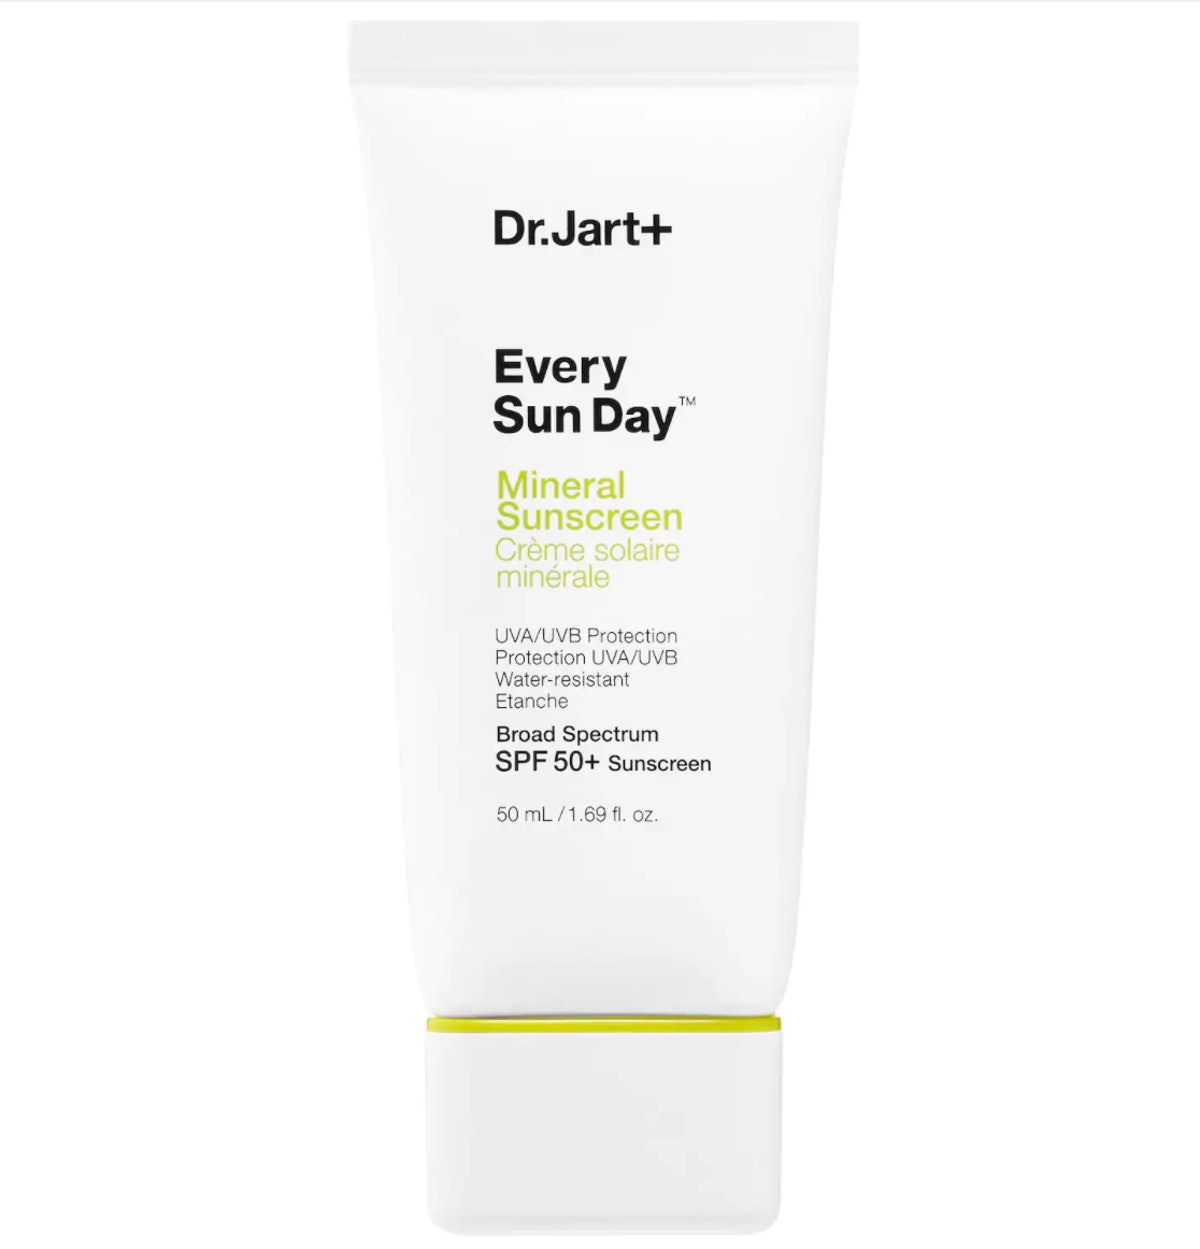 Every Sun Day Mineral Sunscreen SPF 50+